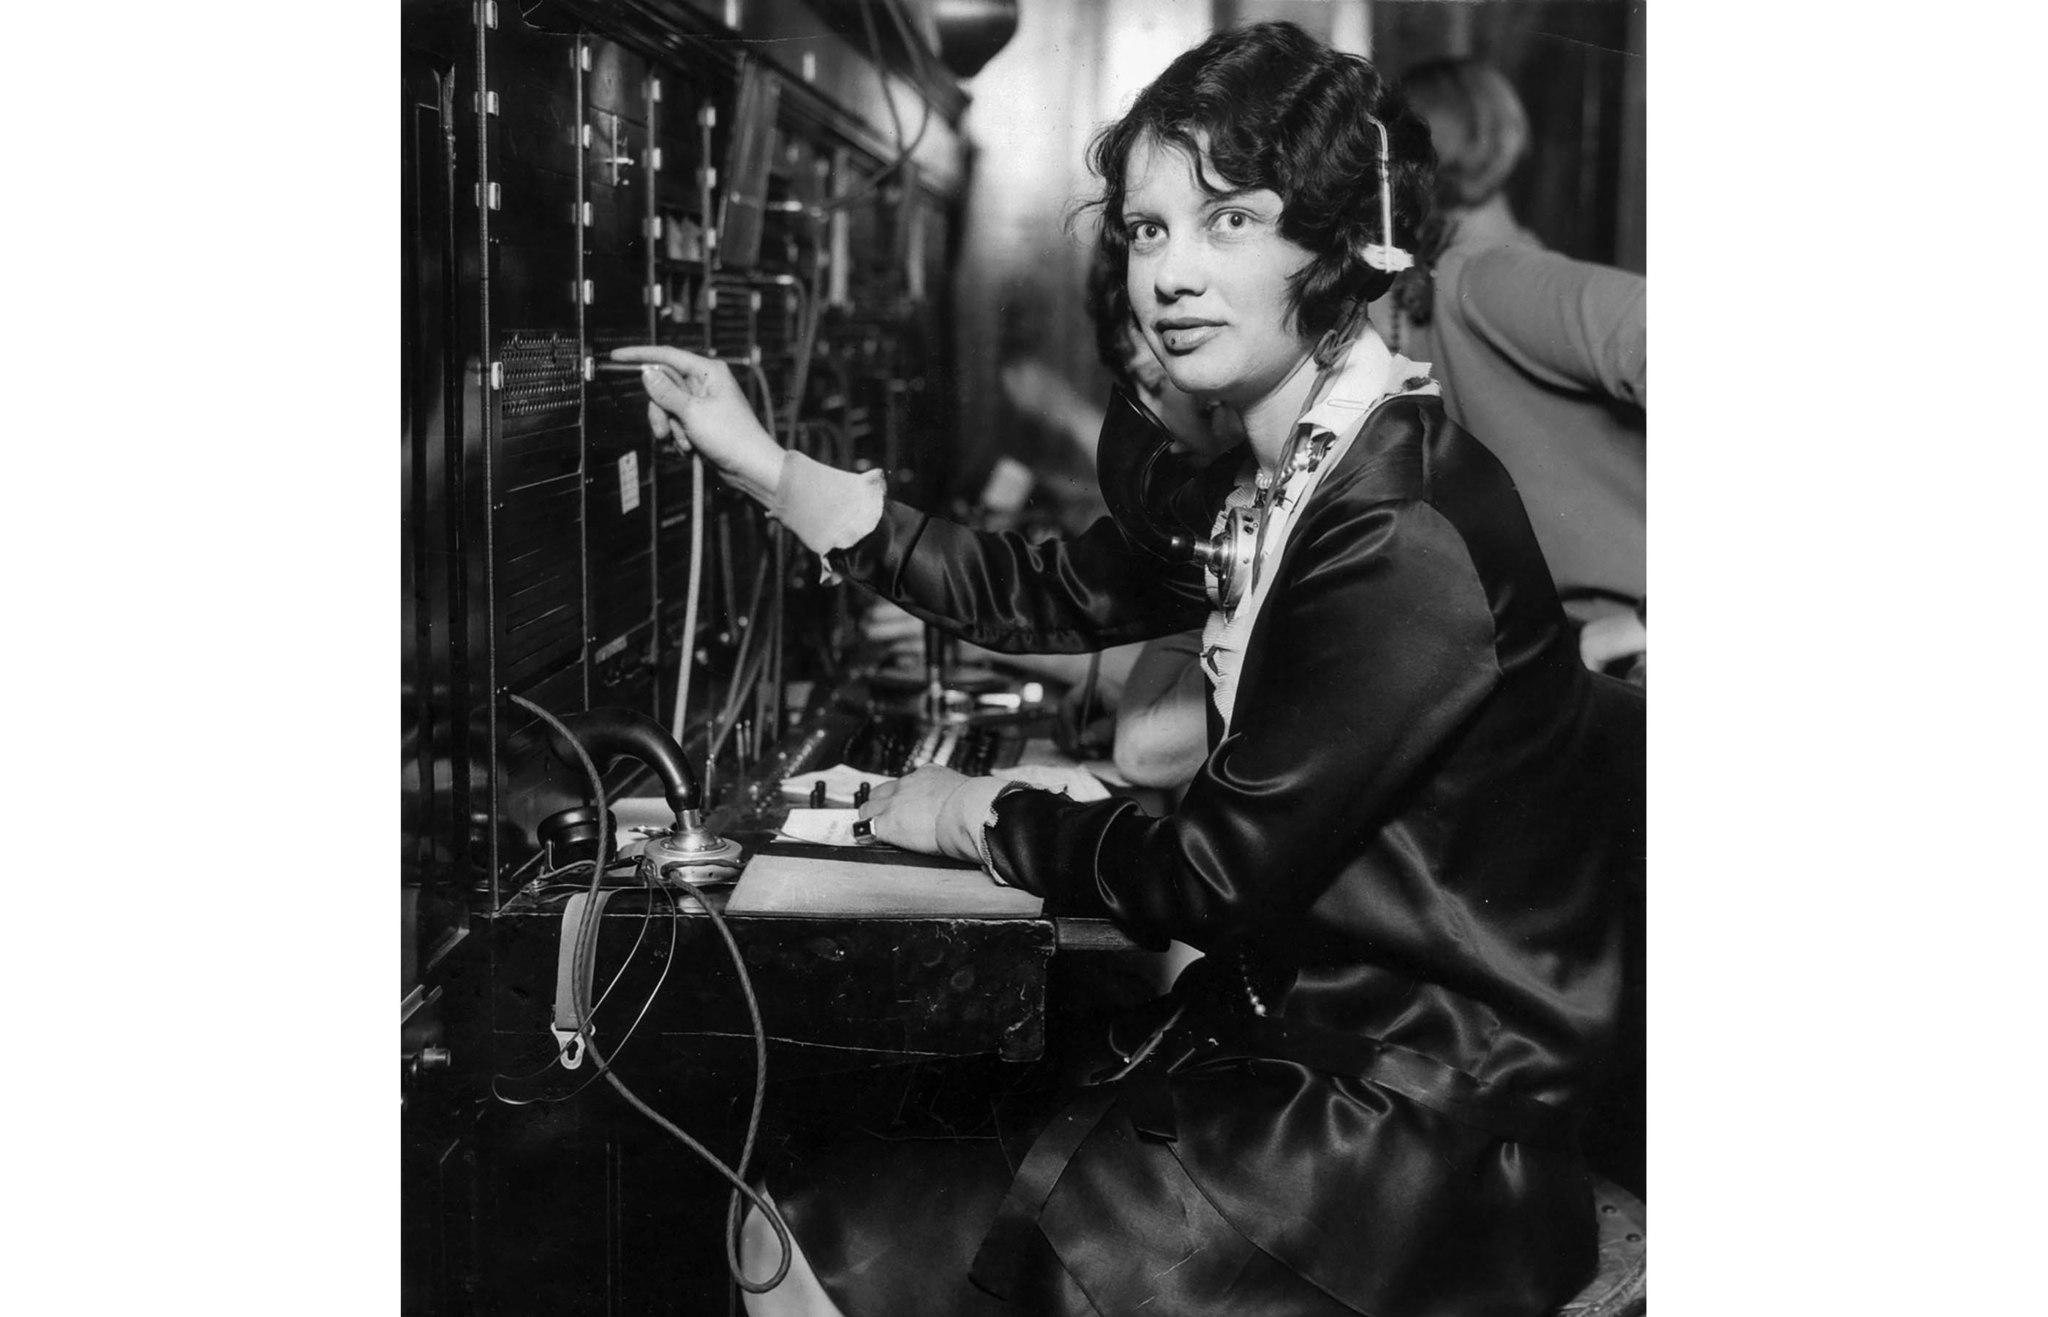 March 14, 1928: Telephone operator Louise Gipe at Santa Paula warned area residents of the failure o